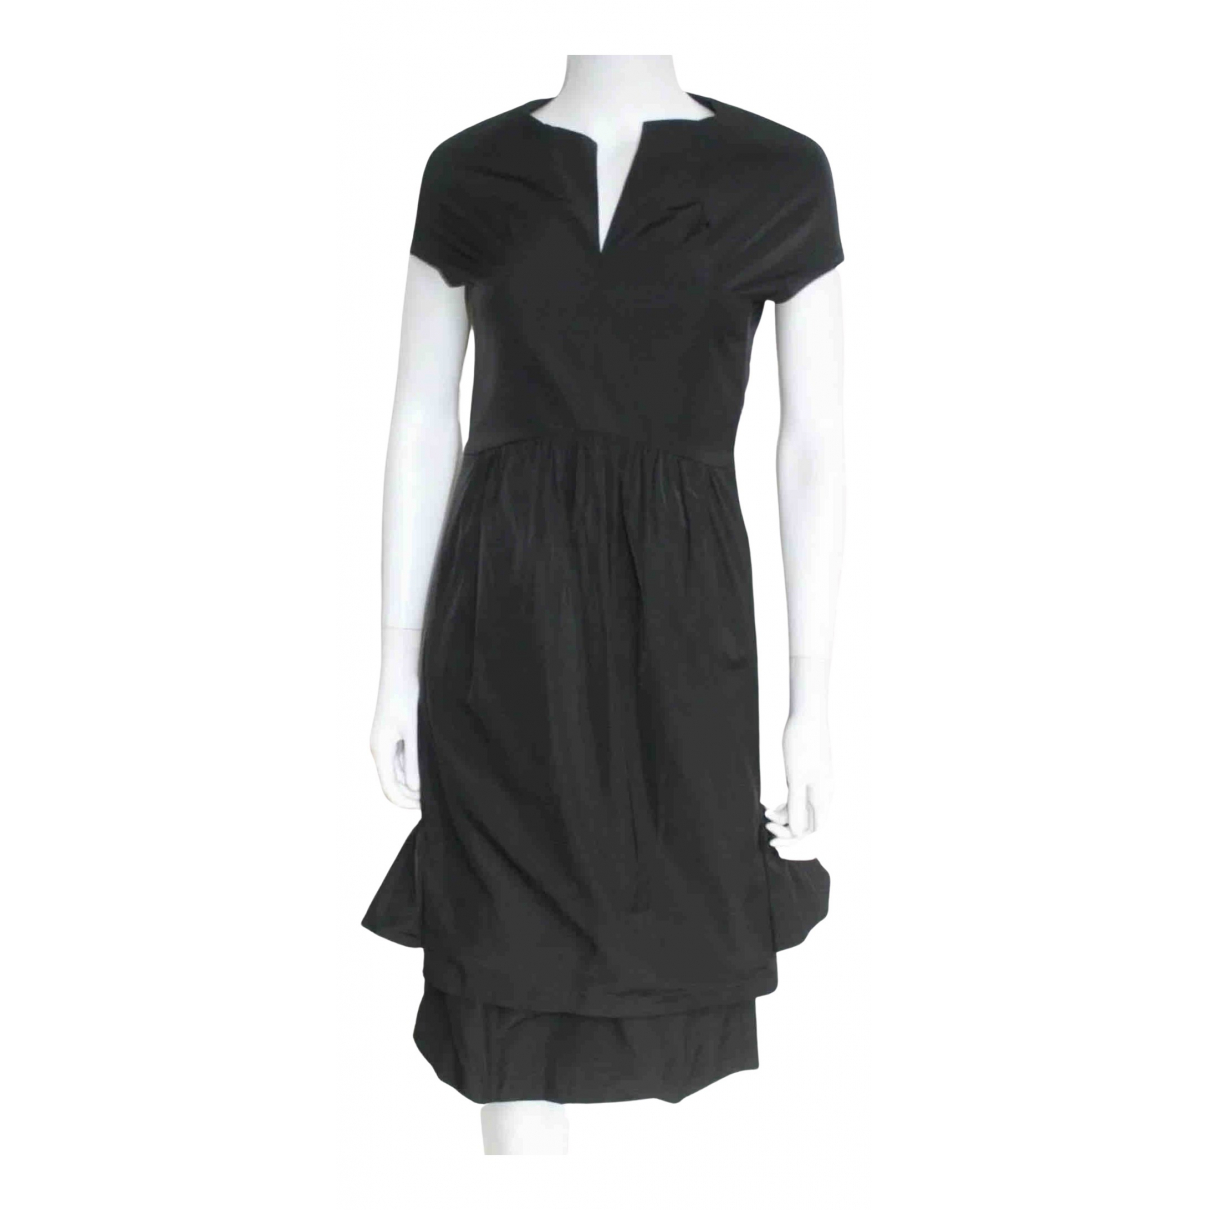 Dries Van Noten \N Kleid in  Schwarz Polyester